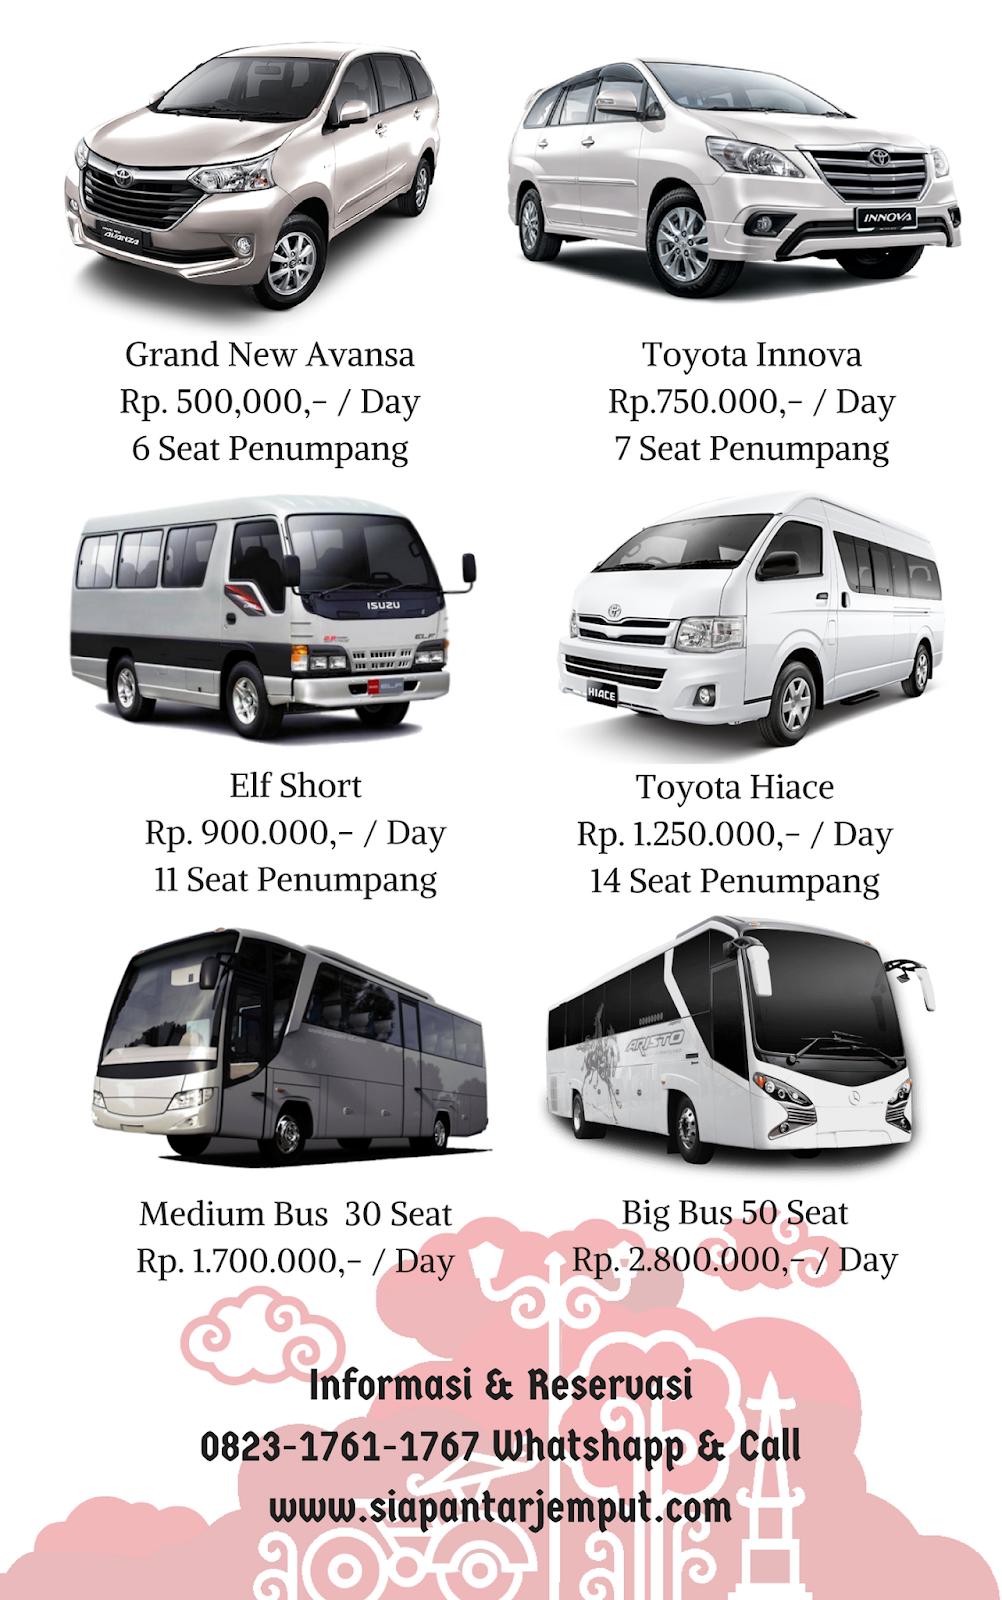 Rental Mobil Jogja || Sewa Mobil Murah di Yogyakarta